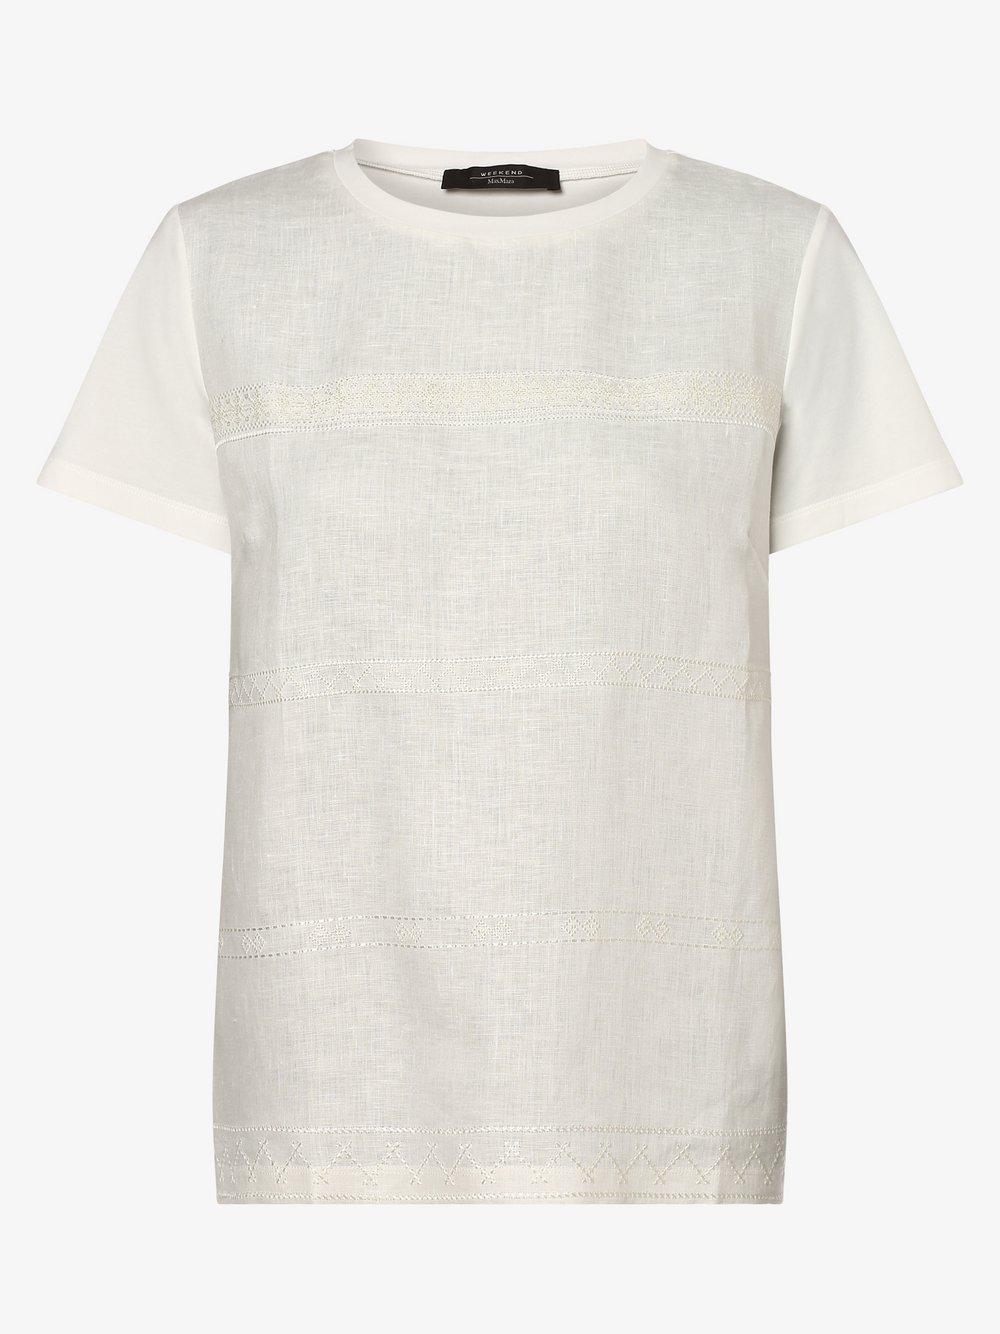 Weekend Max Mara - T-shirt damski z dodatkiem lnu – Ori, beżowy